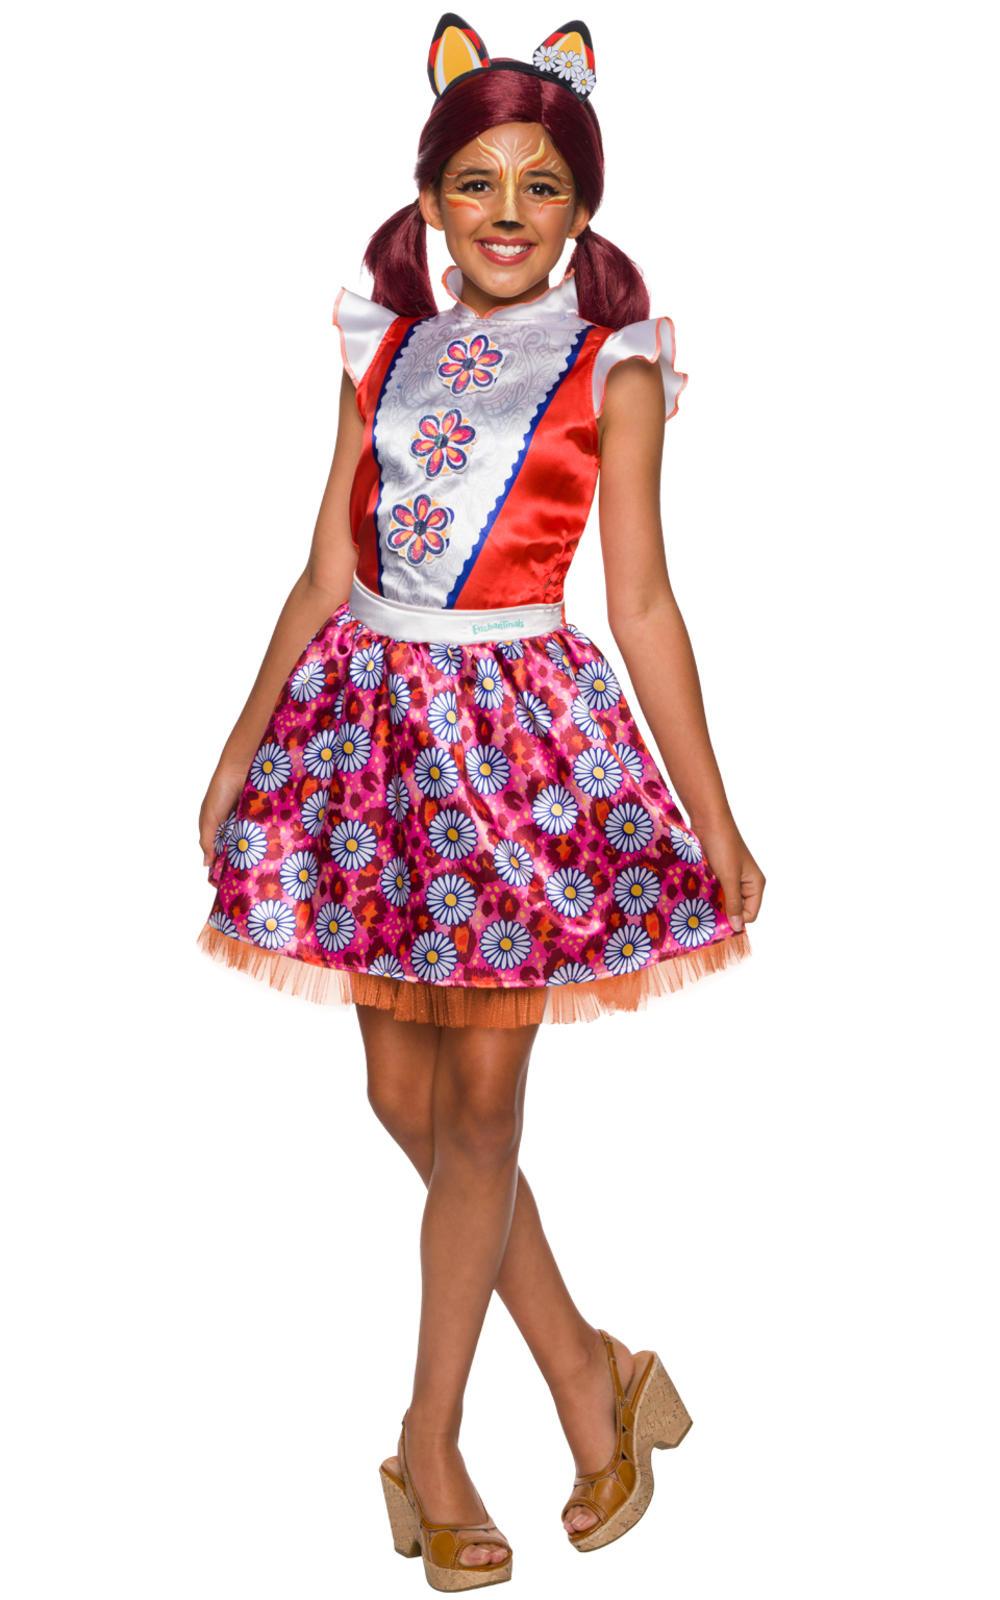 Felicity Fox Girls Fancy Dress Enchantimals Fairy Tale Animal Kids Costume New